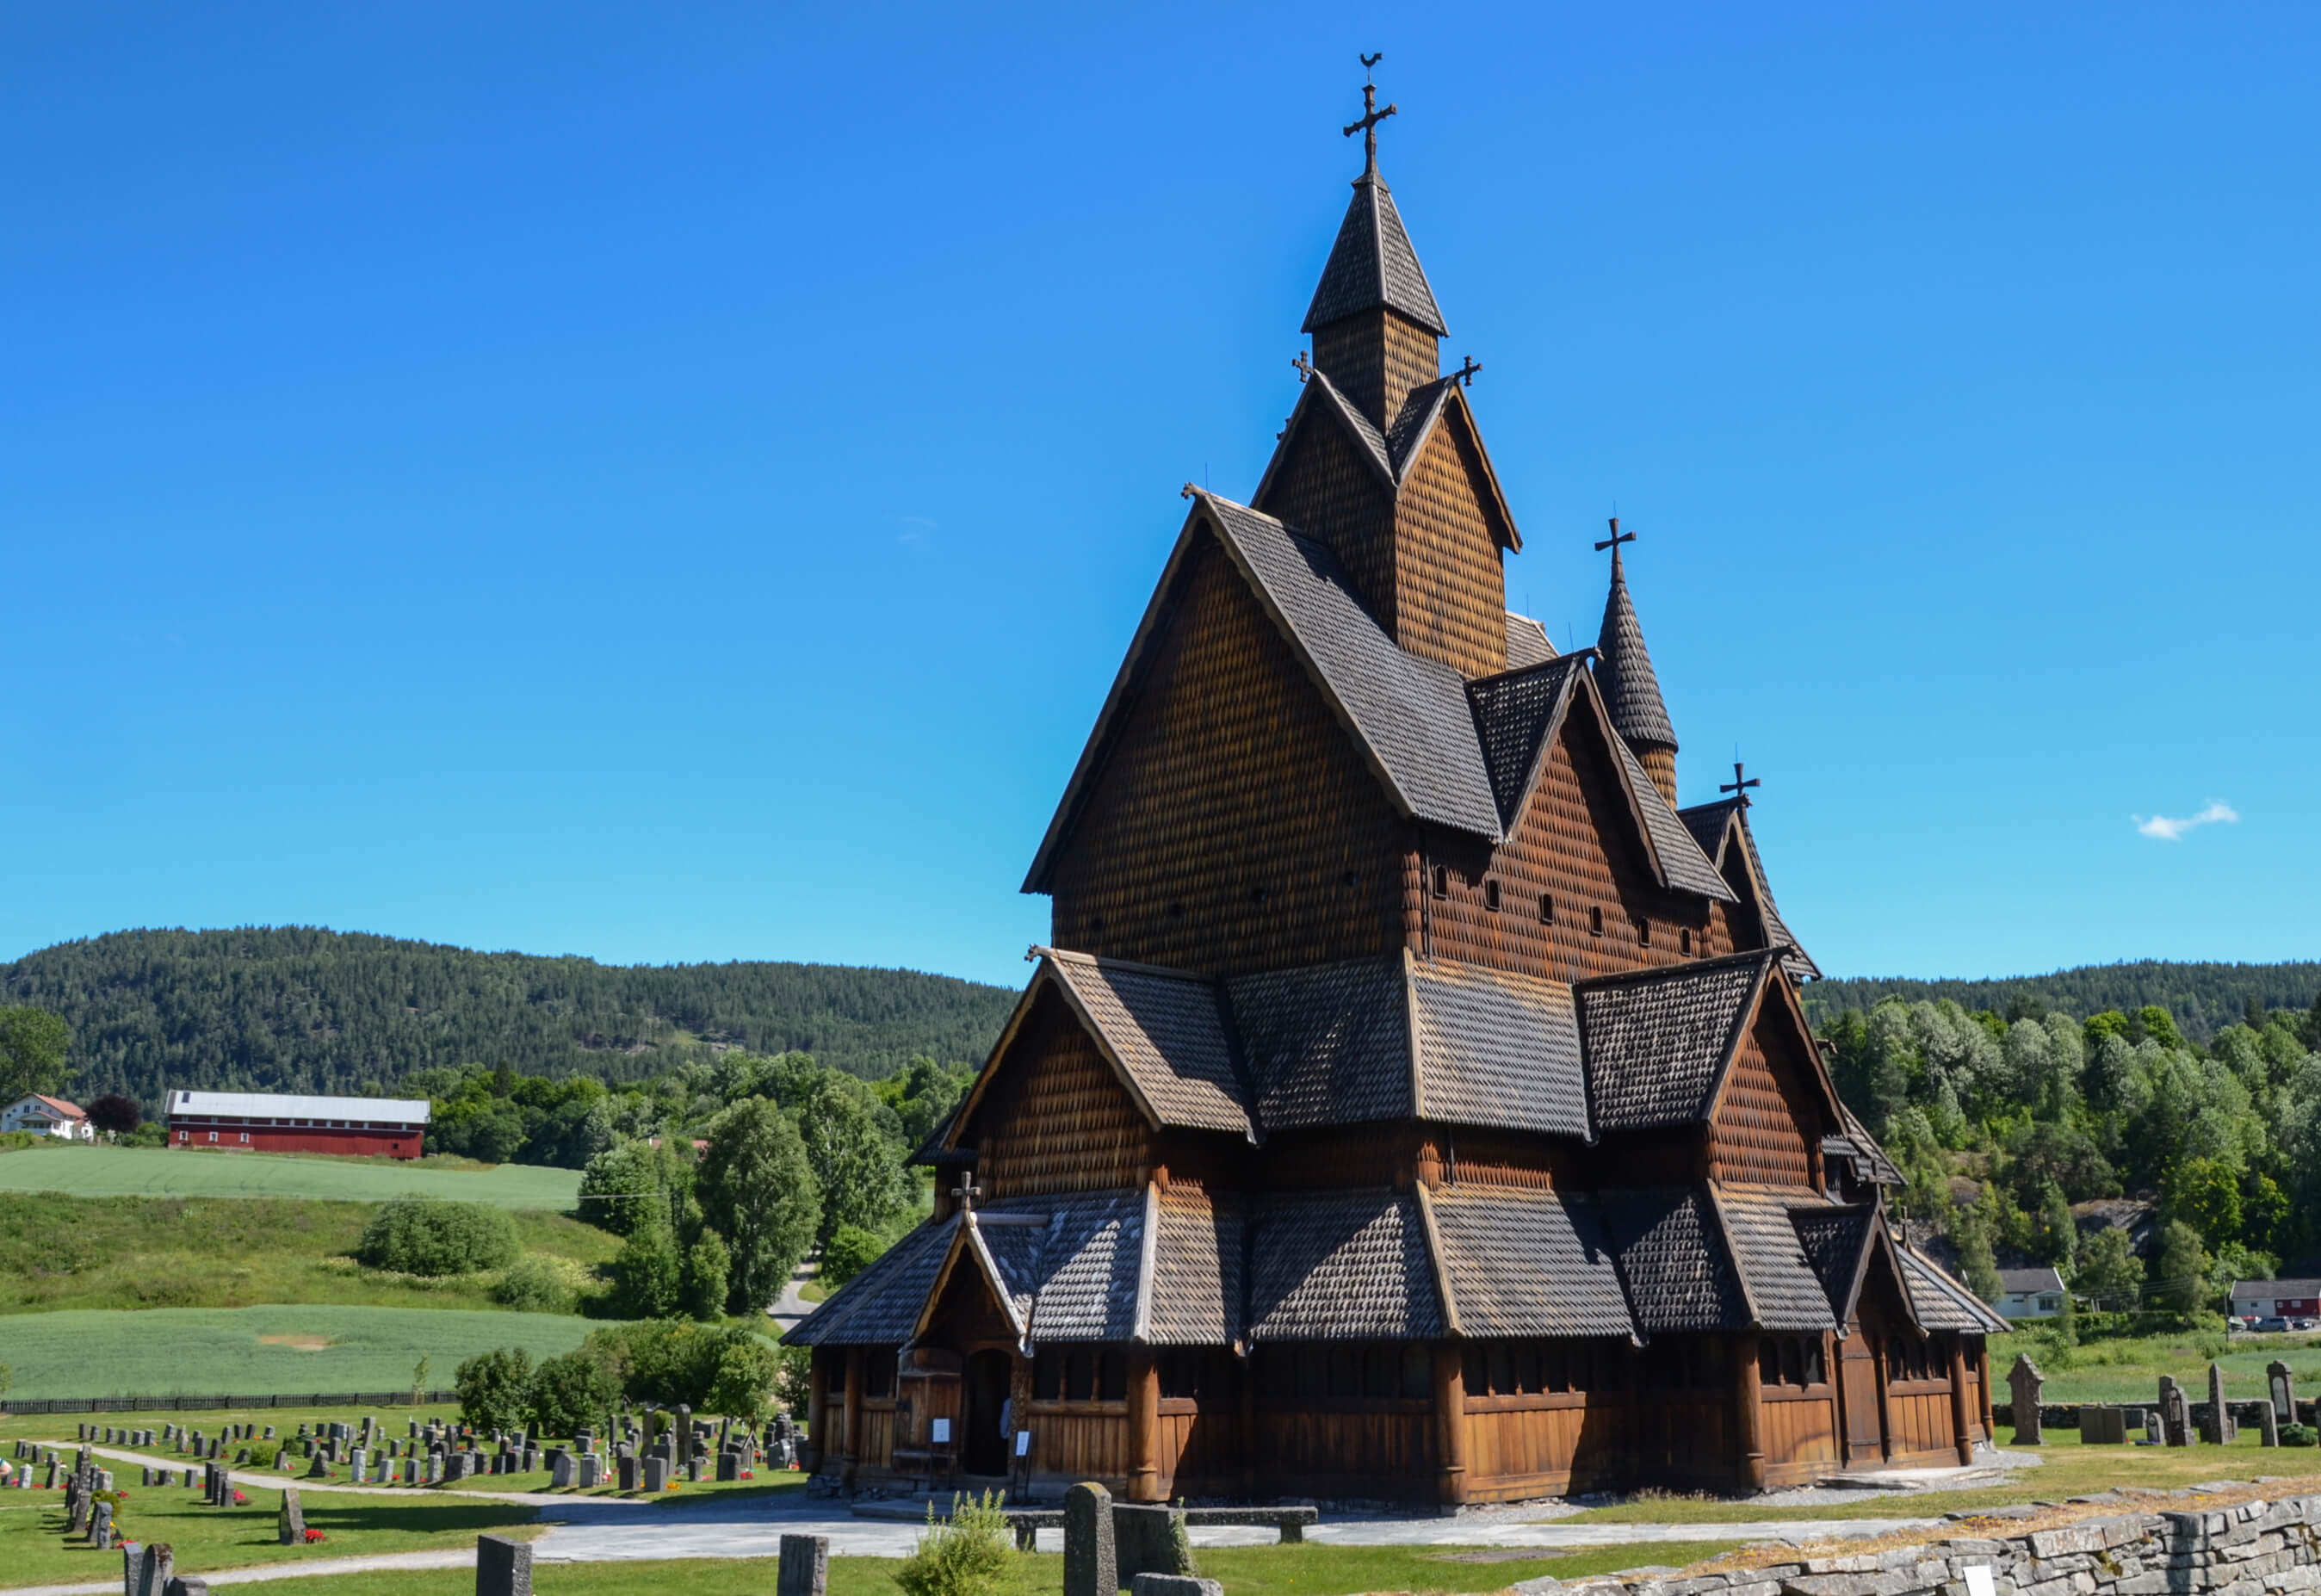 Heddal stavkirke er Norges største stavkirke